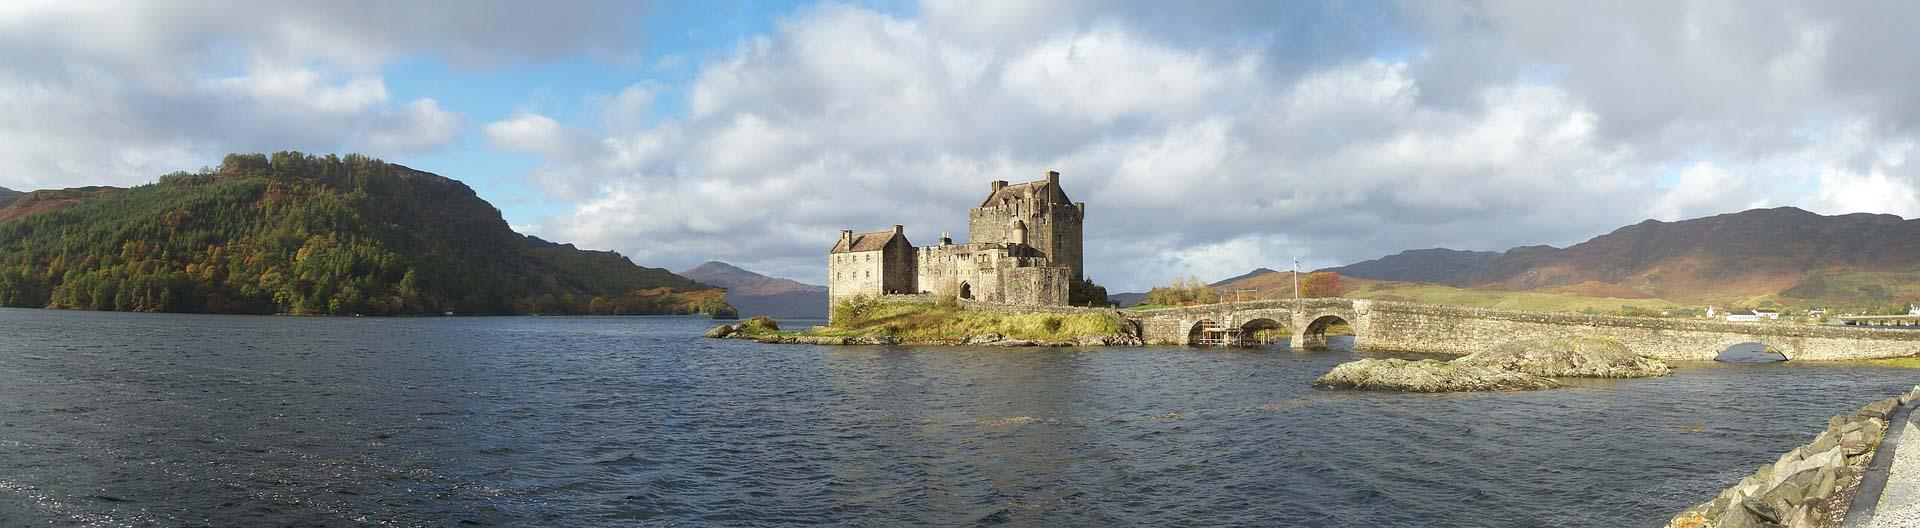 Legendarisch Schotland